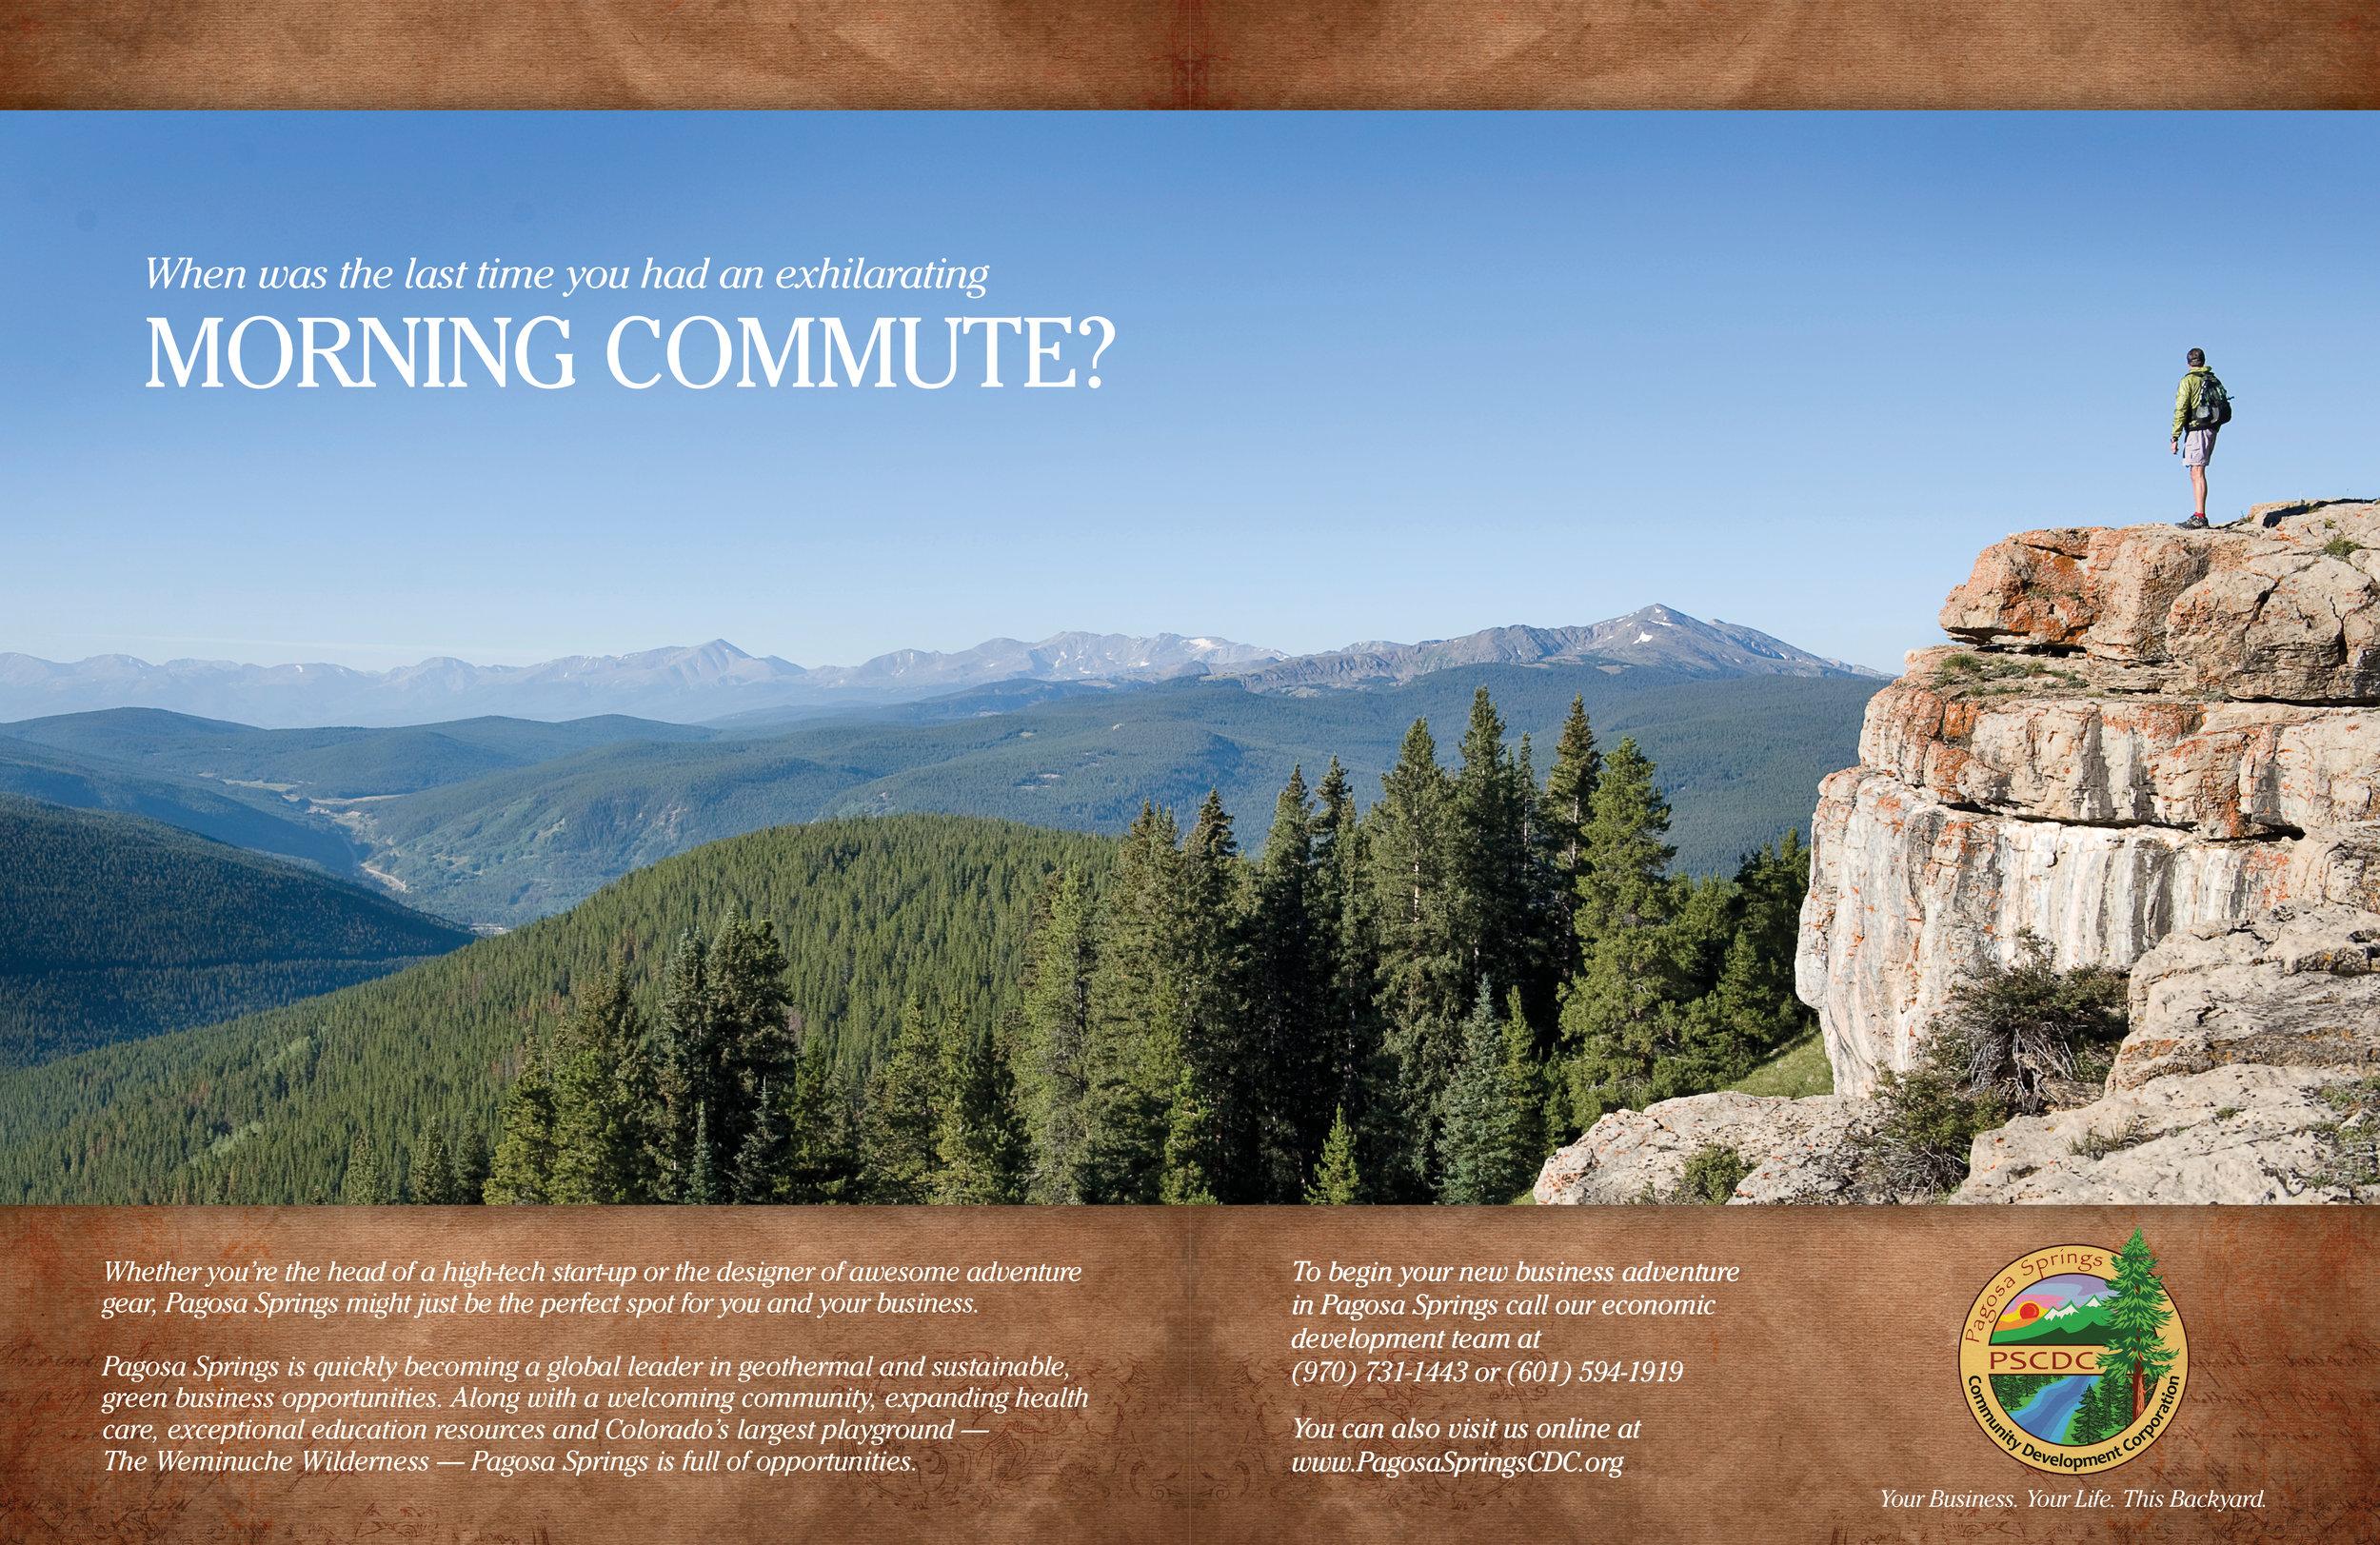 cdc commute spread.jpg